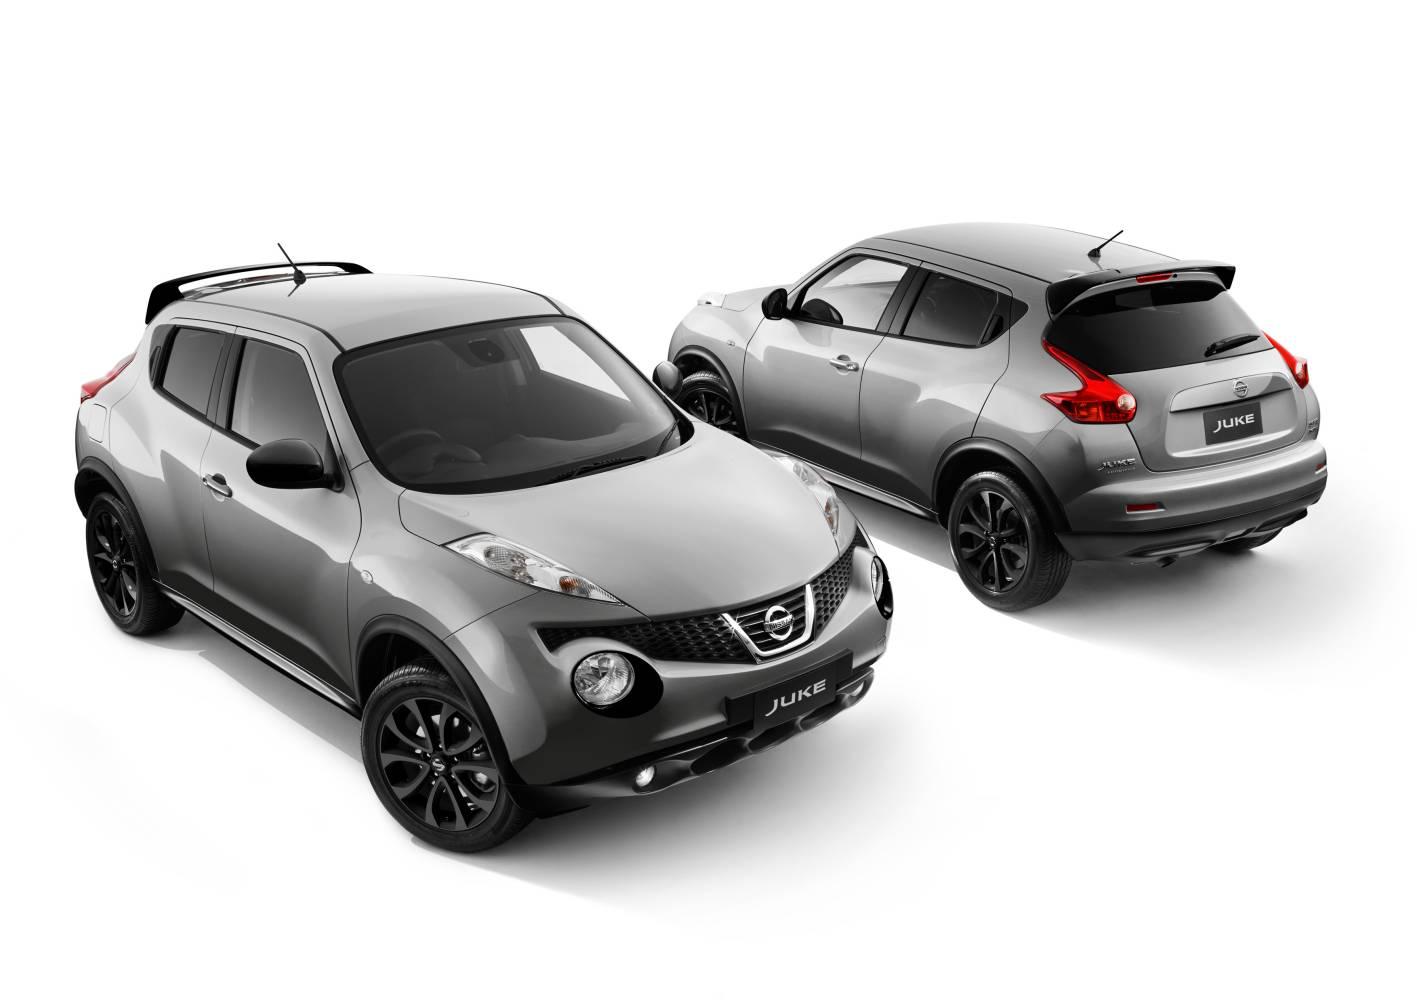 Midnight Nissan 2020 Juke Edition